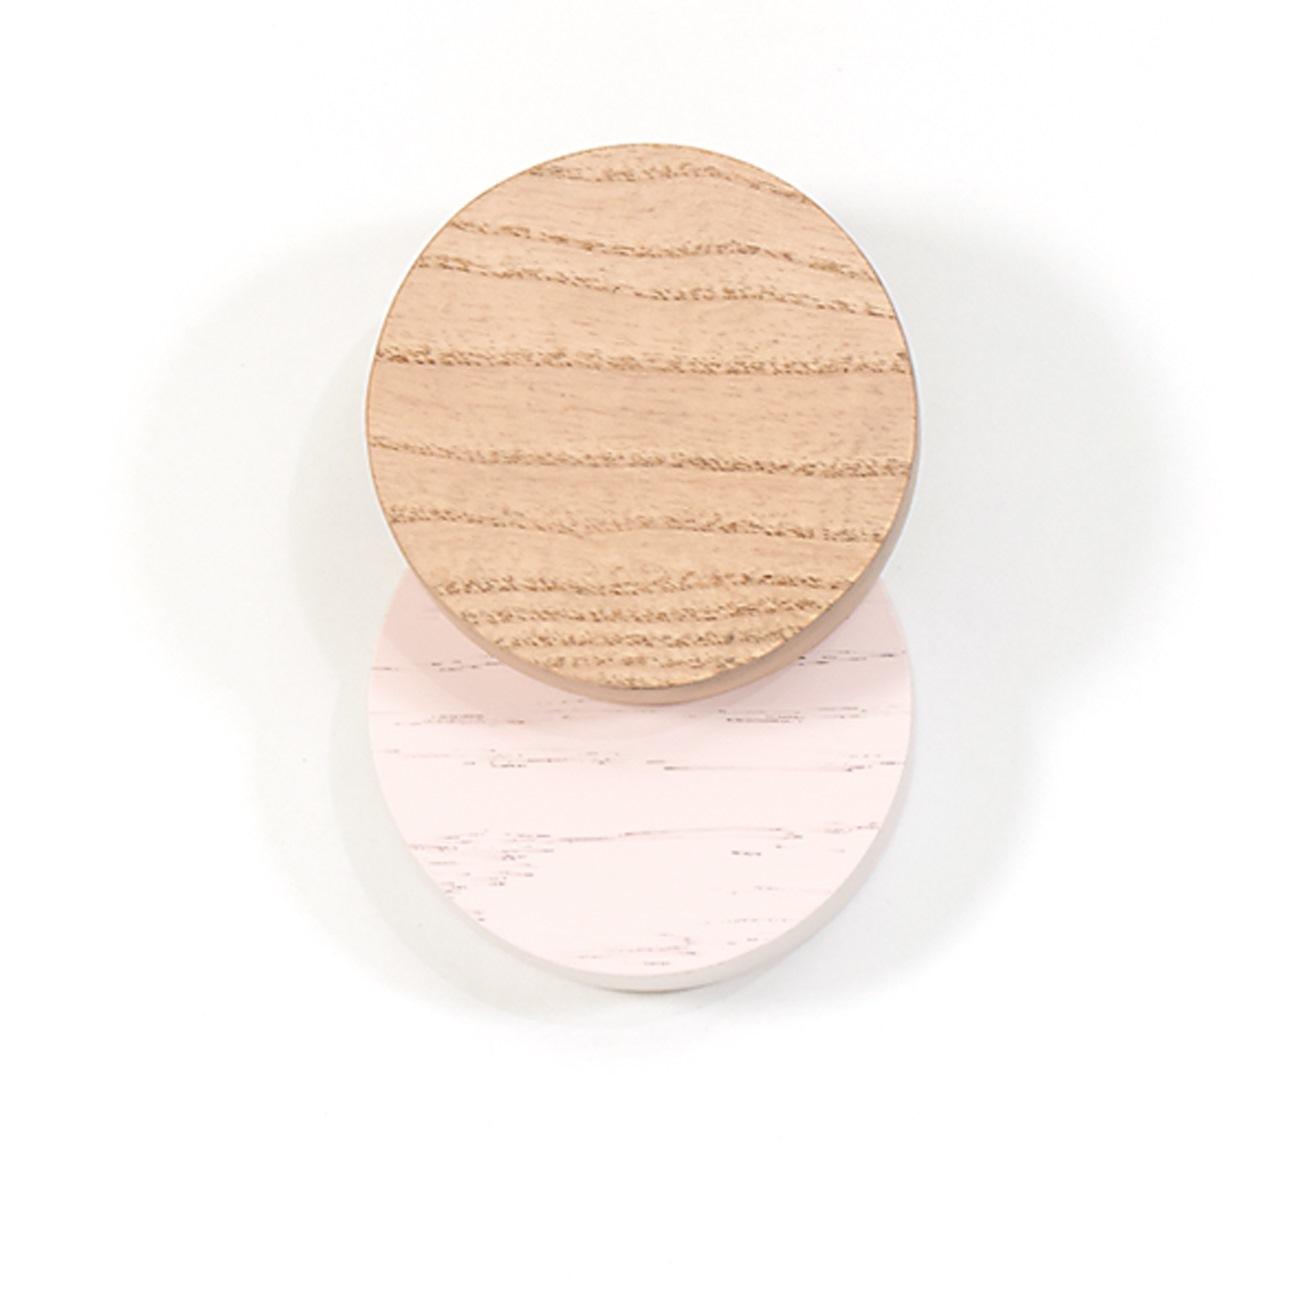 Lou Garderobenhaken Hartô -Eiche natur / Pastellrosa